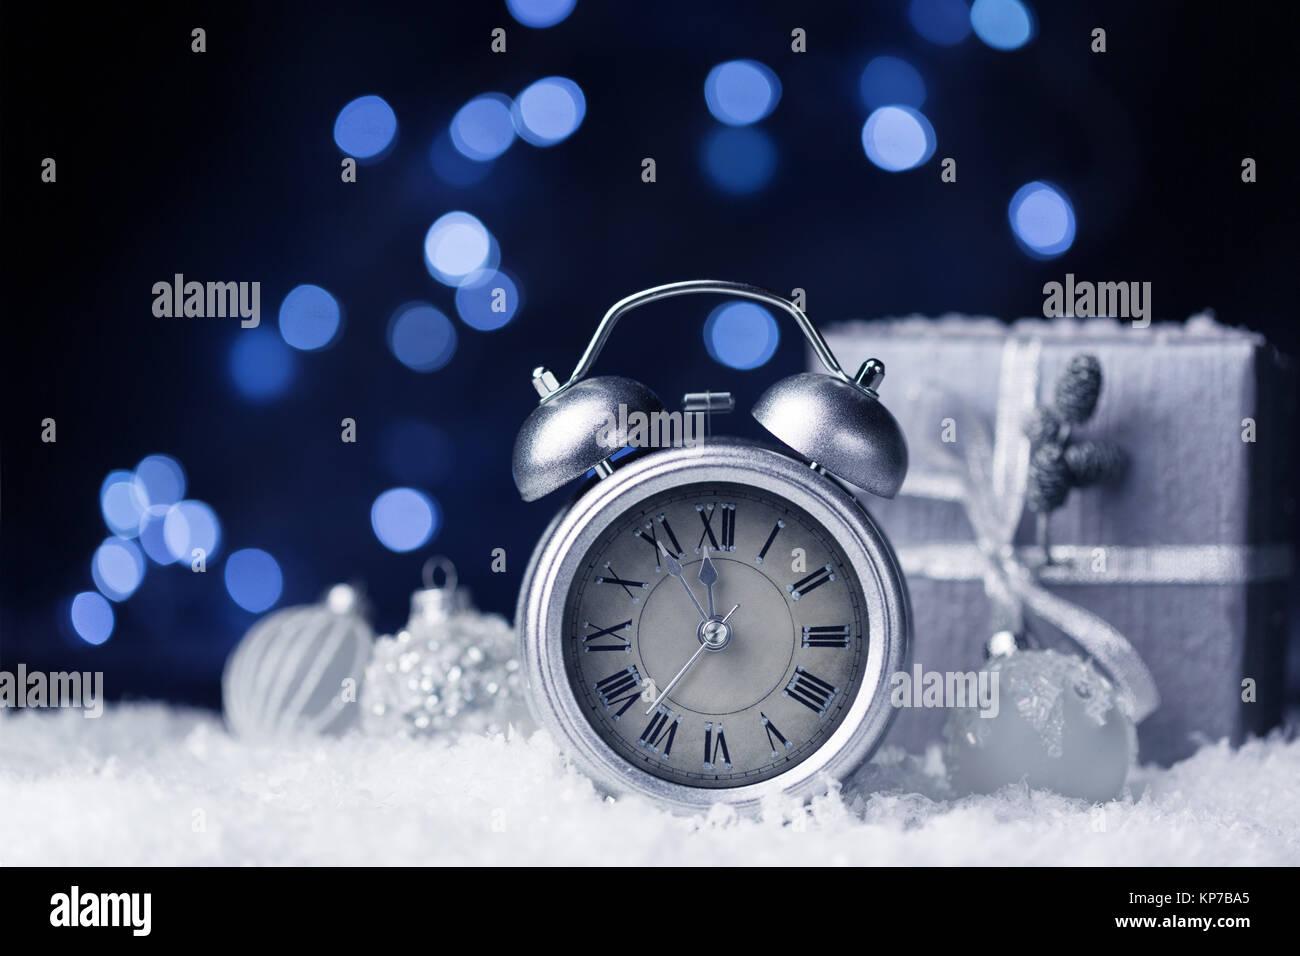 Nearly twelve o'clock, New Year dark festive background, copy space - Stock Image